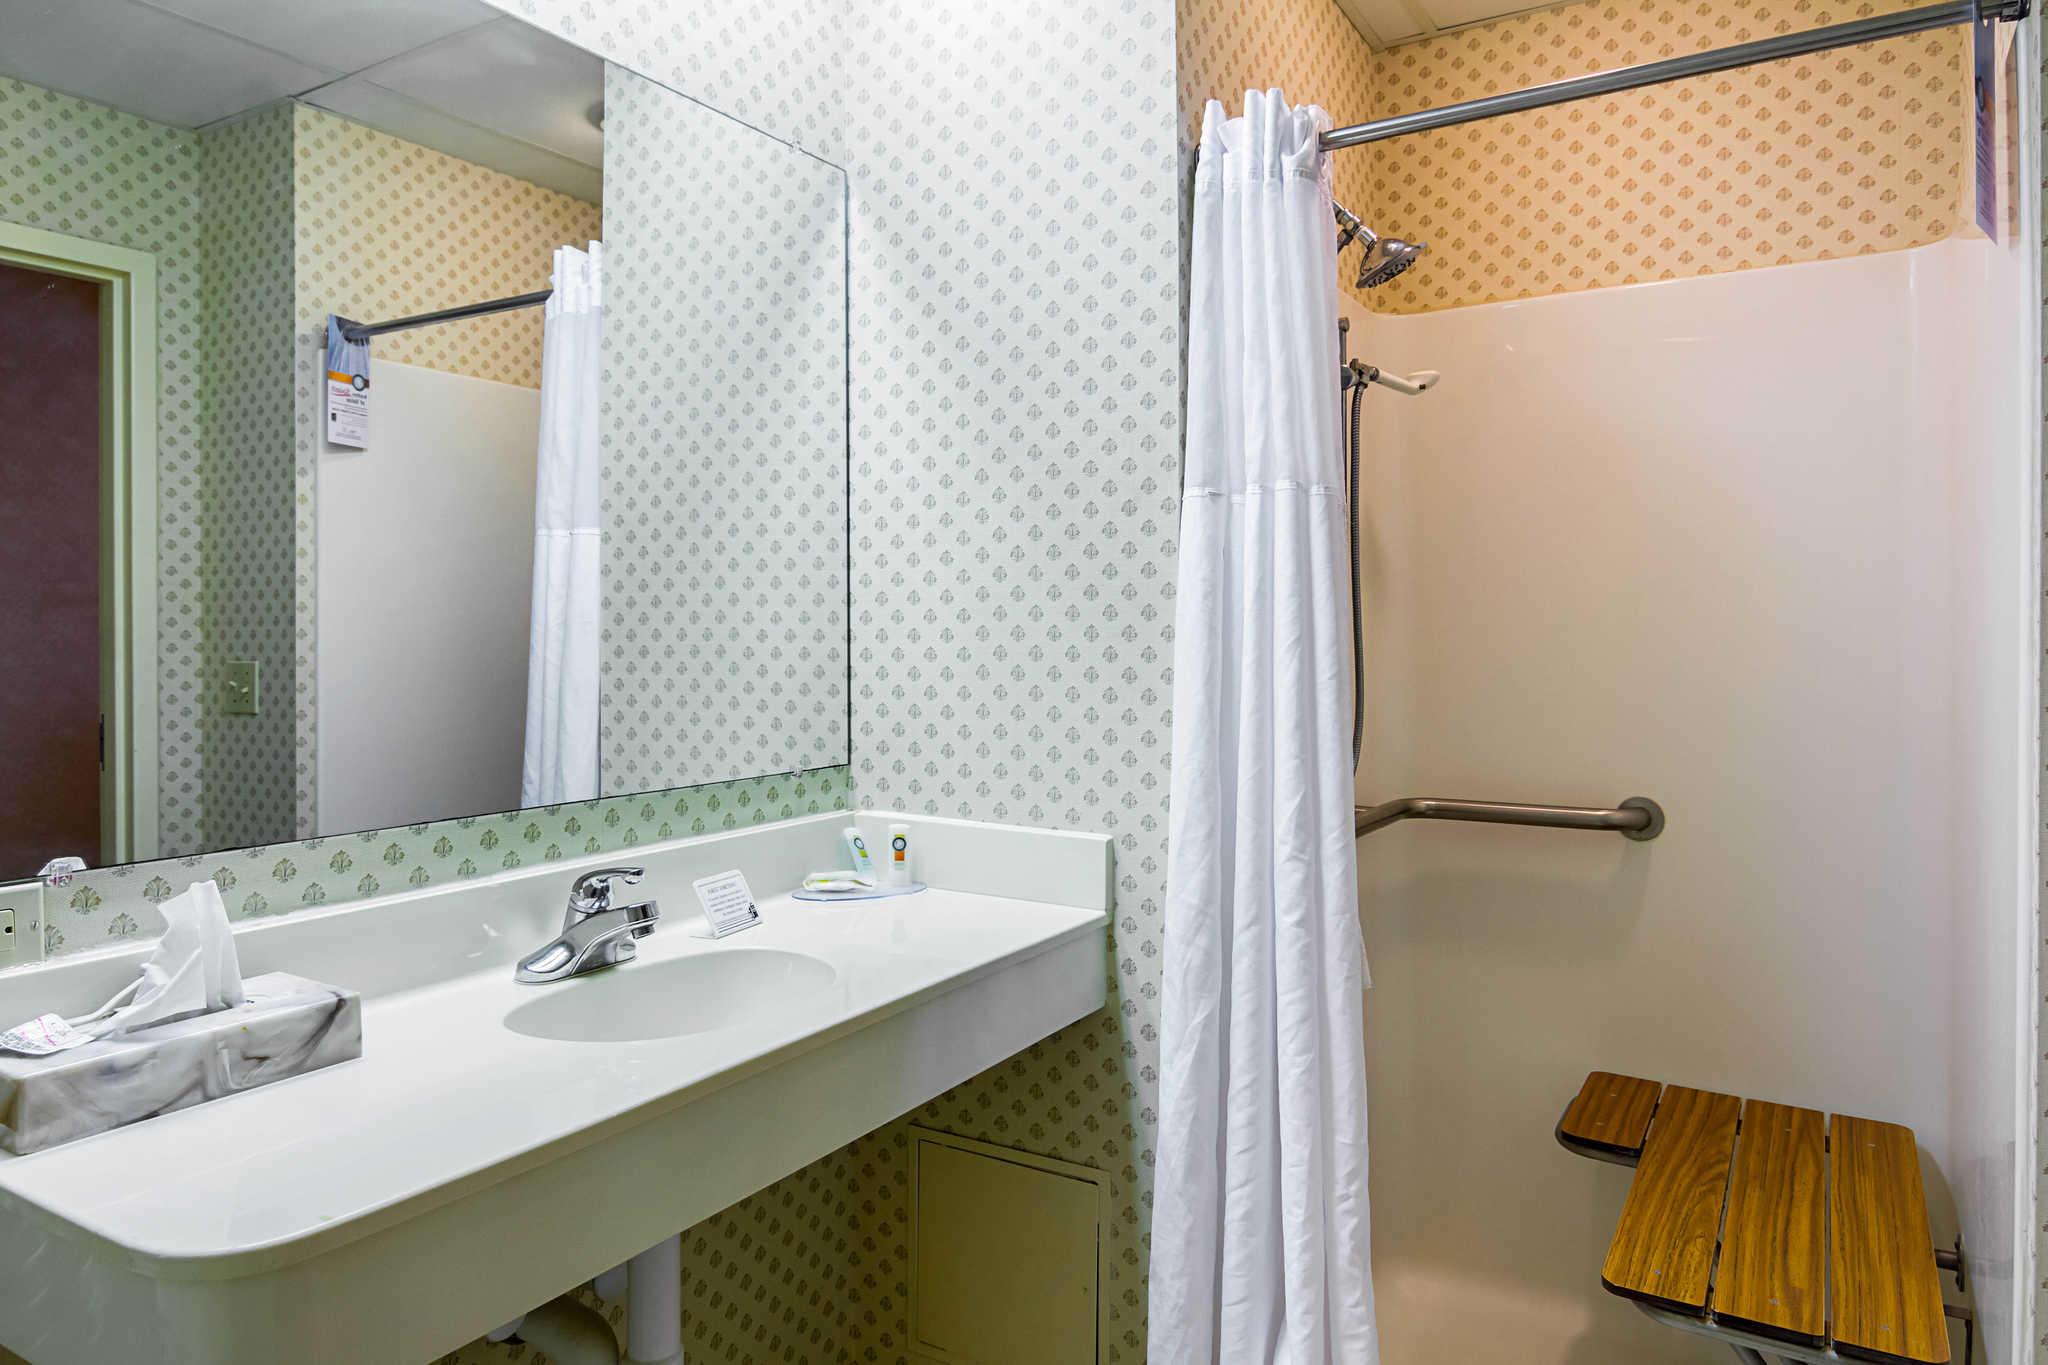 Quality Inn & Suites Kearneysville - Martinsburg image 14